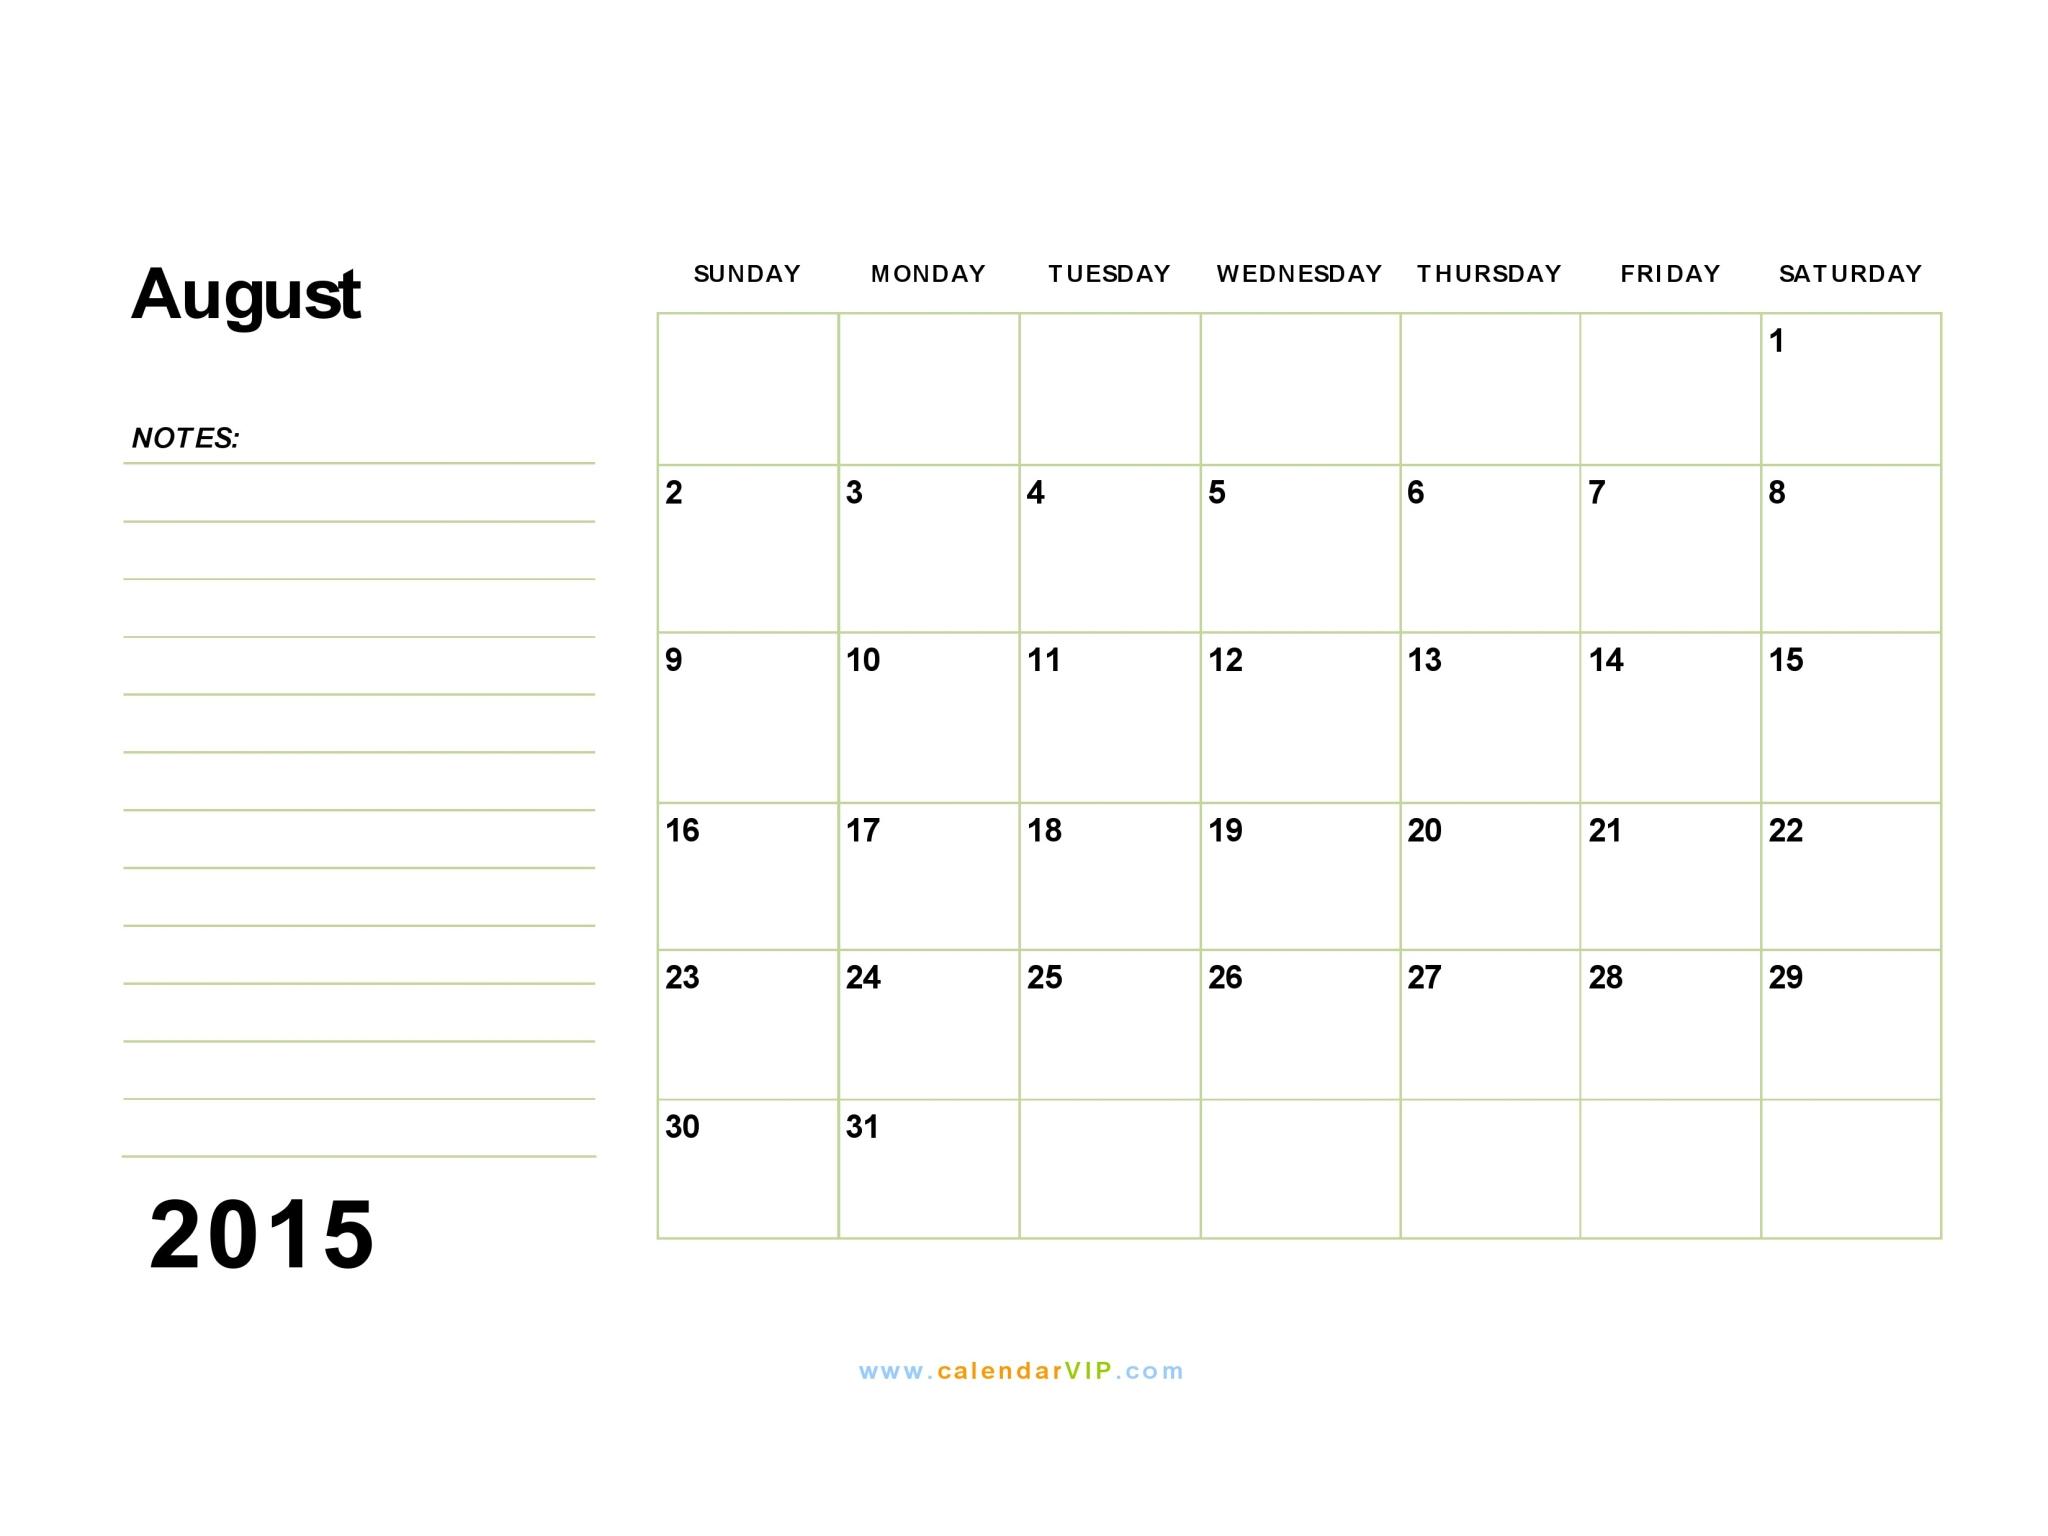 august calendars 2015